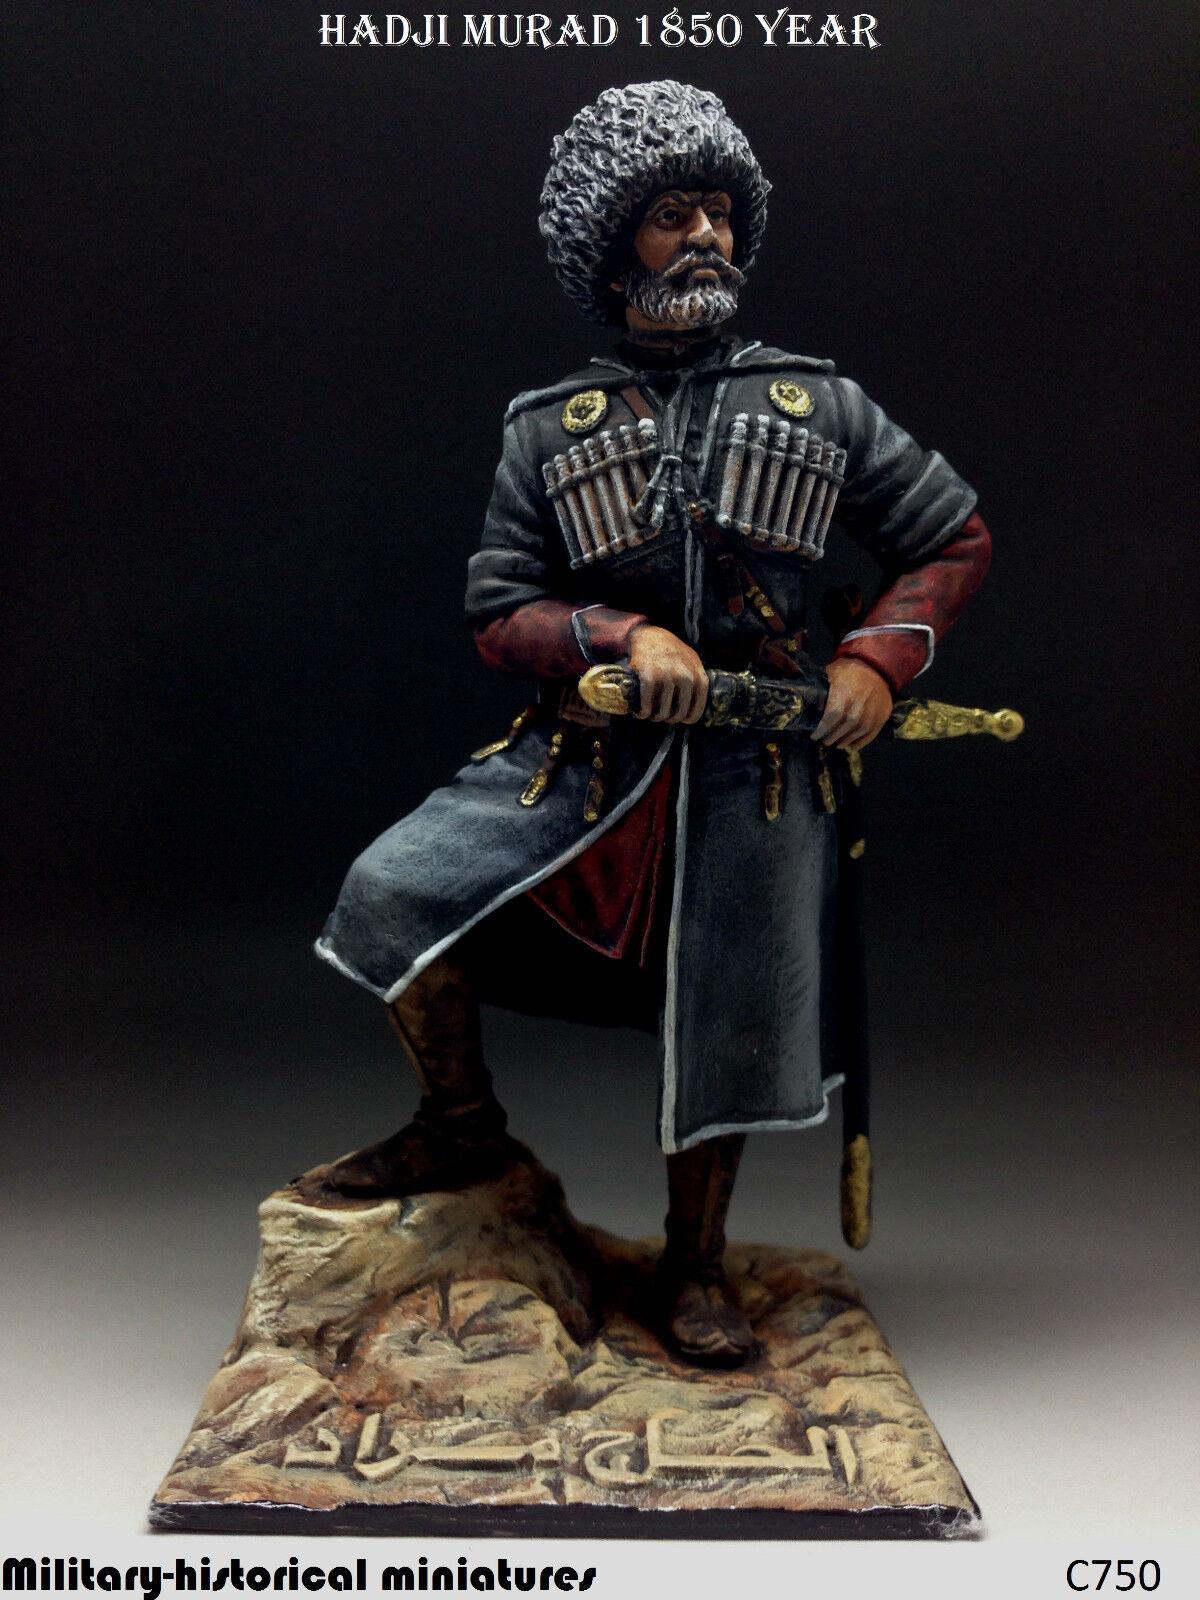 Hadji Murad 1850, Tin leksakssoldat 90 mm, statyn, metallskulptur Hand PAINTED